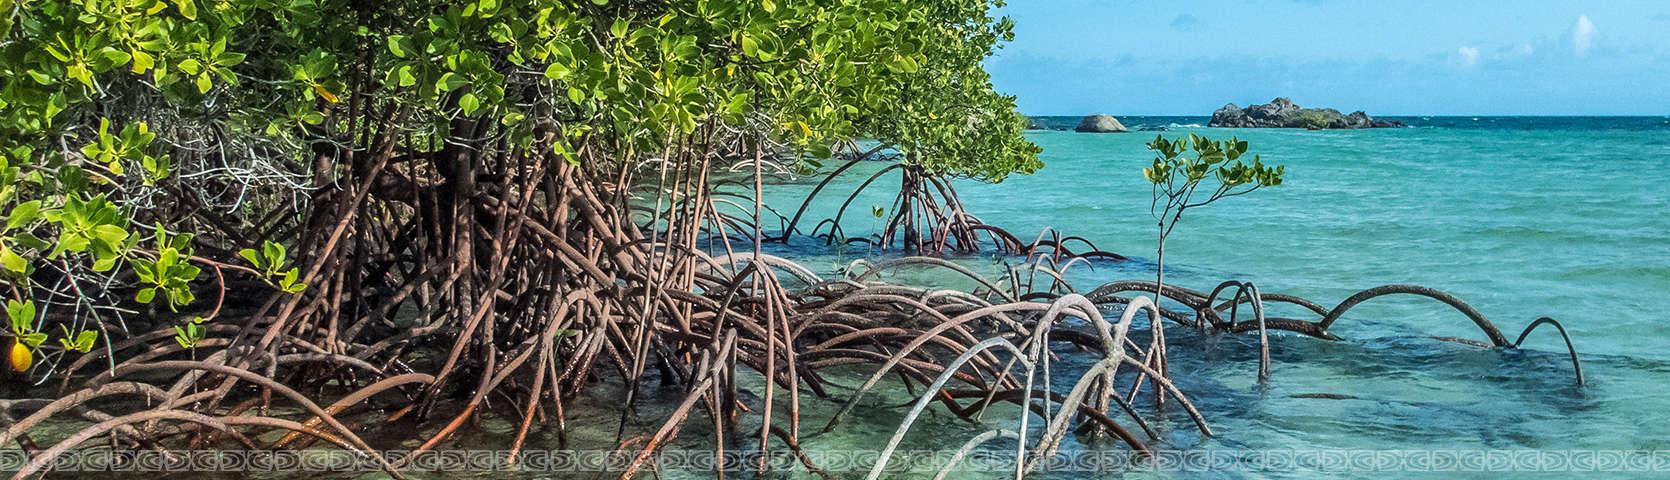 Mangroves in Australia's Top End